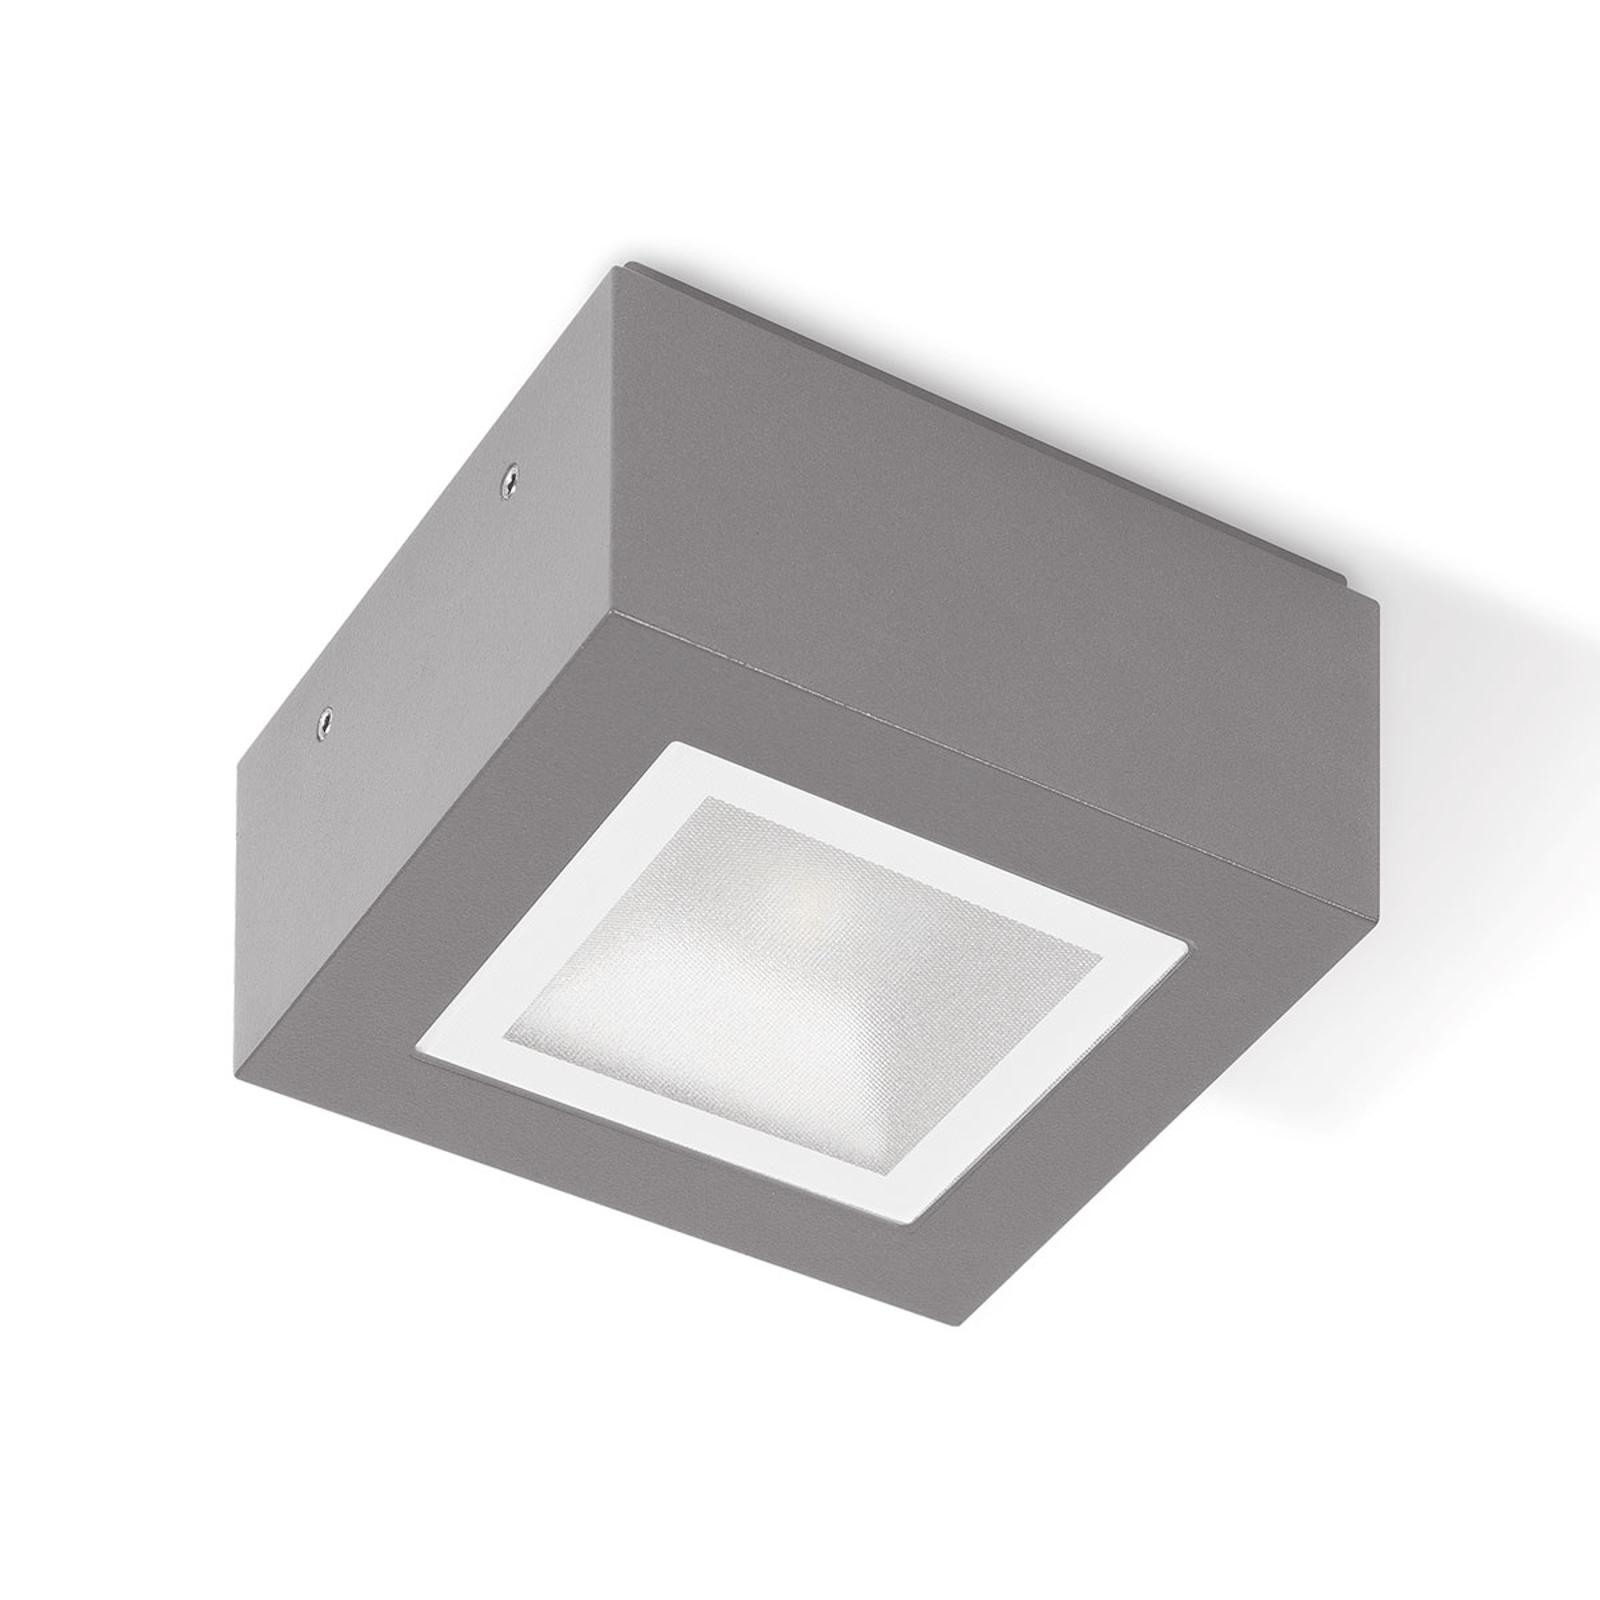 LED-taklampe Mimik 10 Tech Mikroprisma 4000K